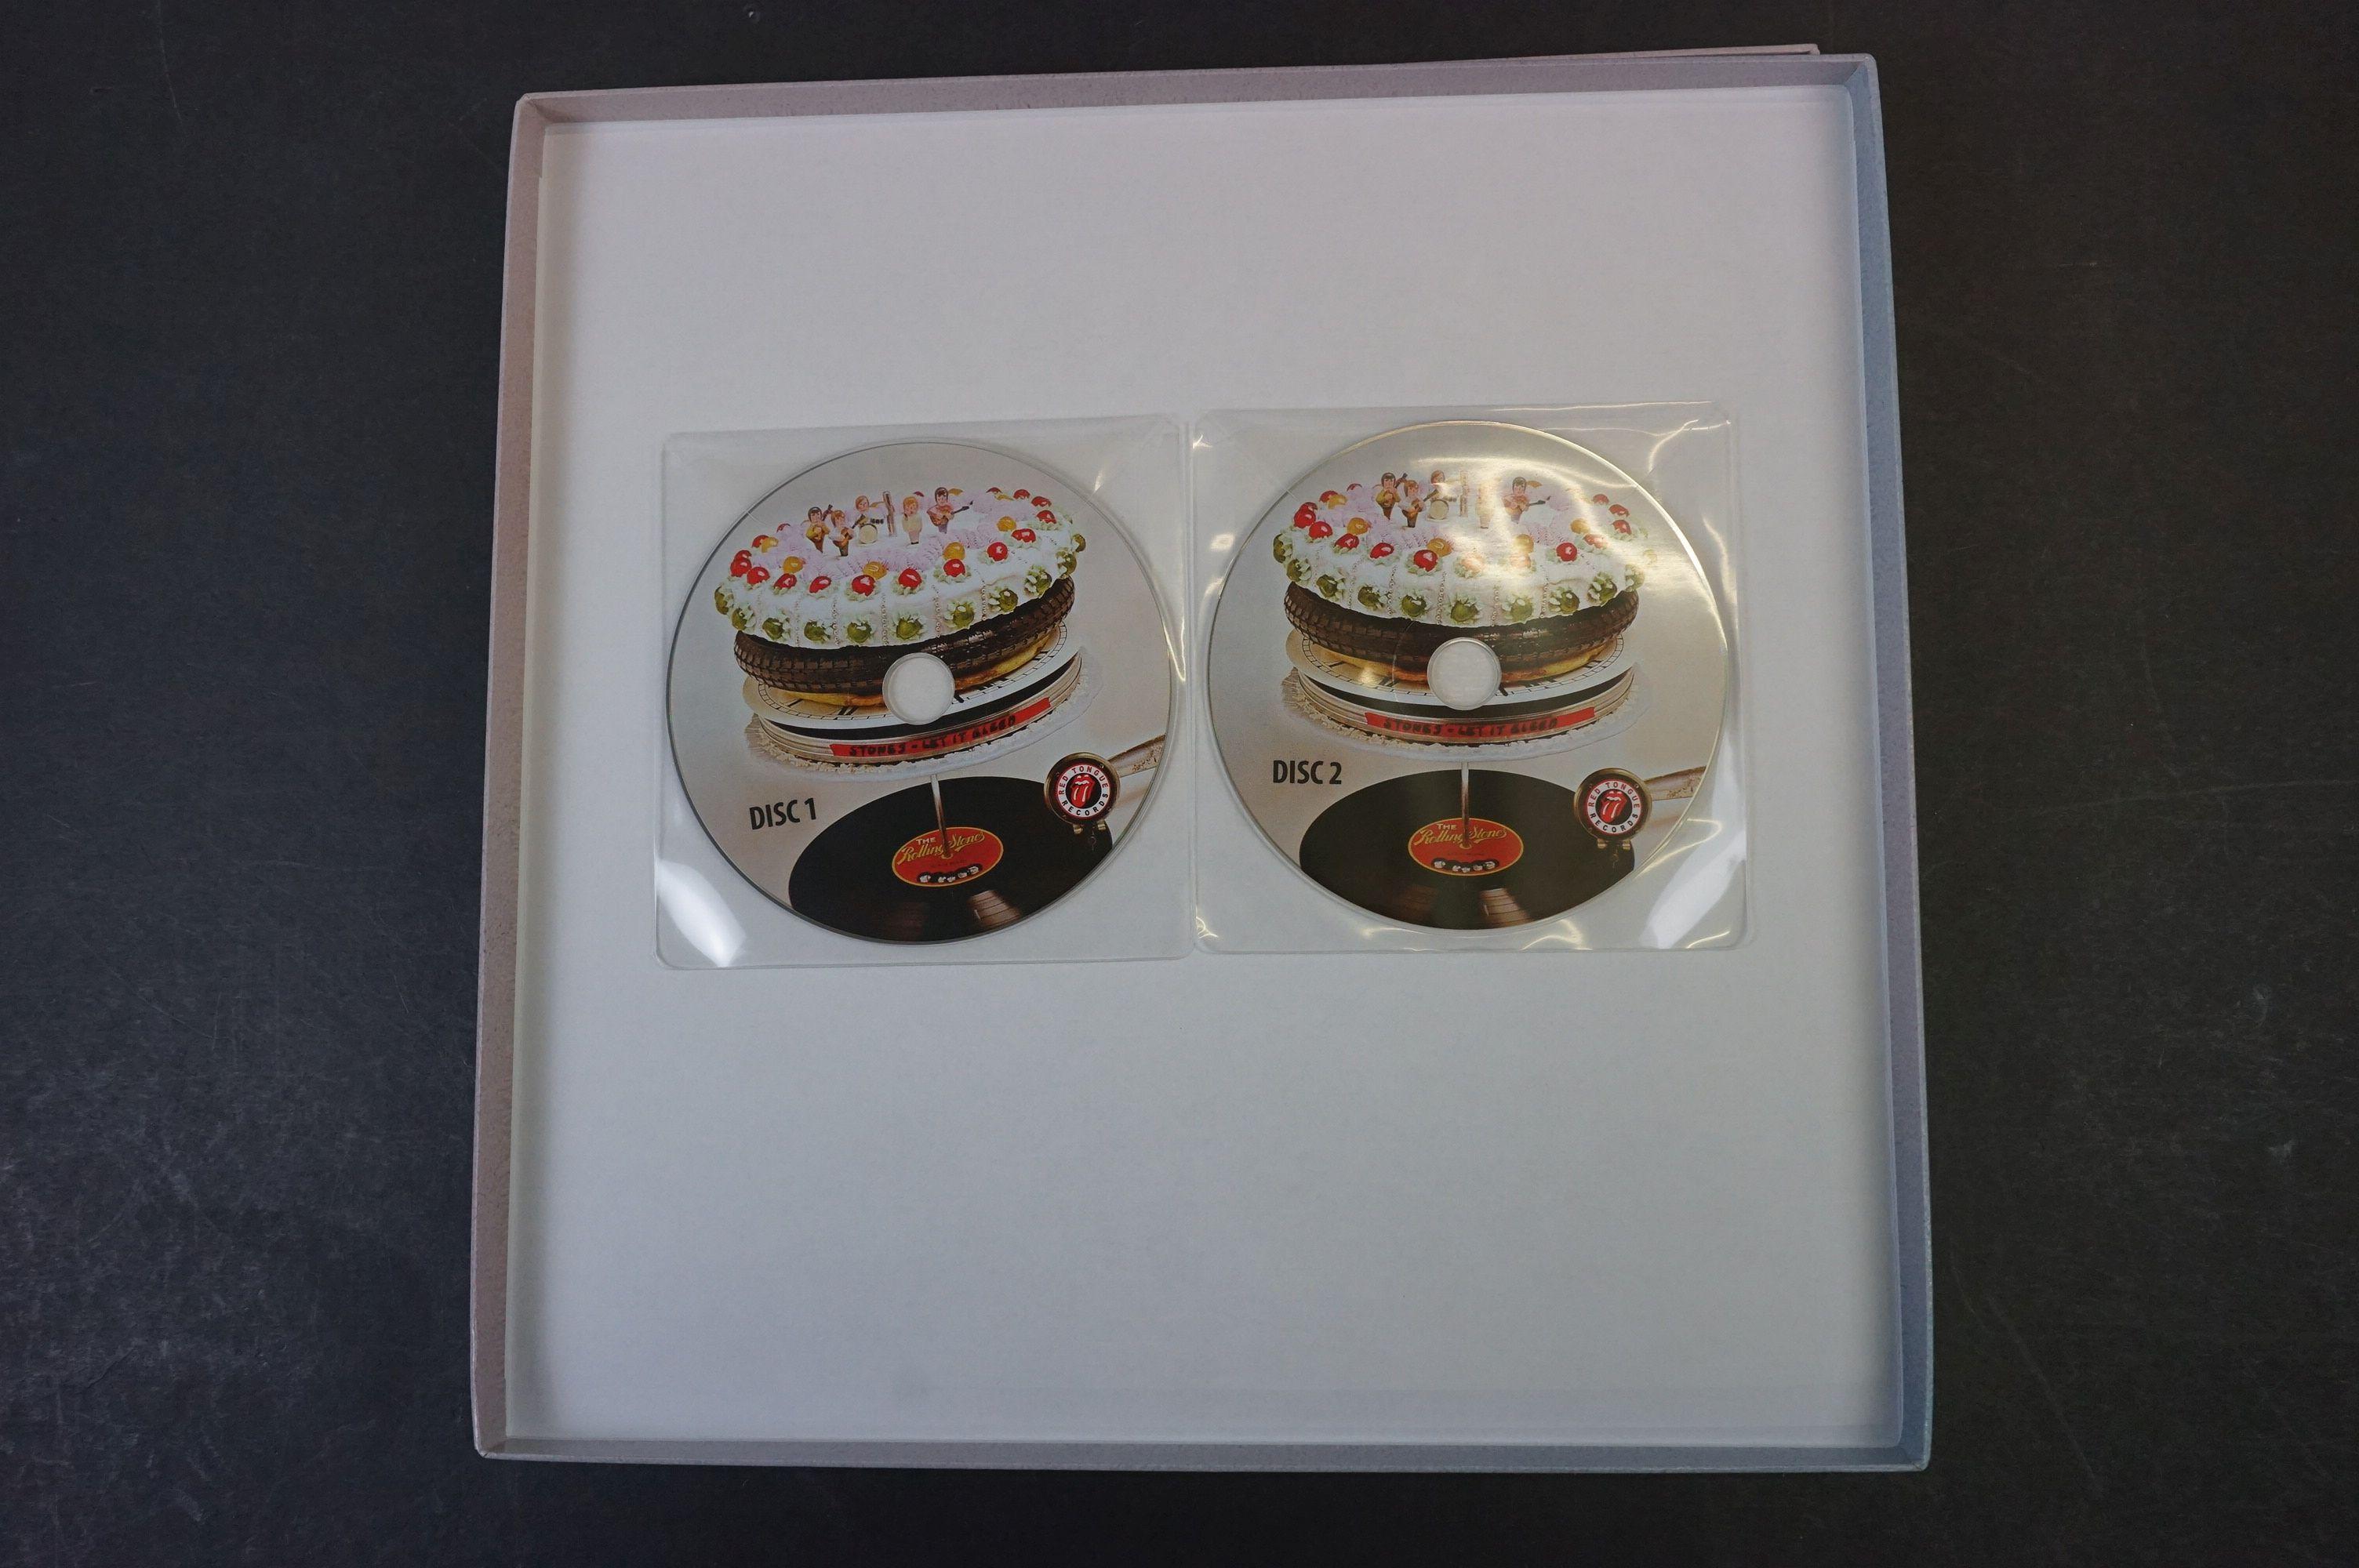 Vinyl - ltd edn The Real Alternate Album Rolling Stones Let It Bleed 3 LP / 2 CD Box Set RTR011, - Image 2 of 9